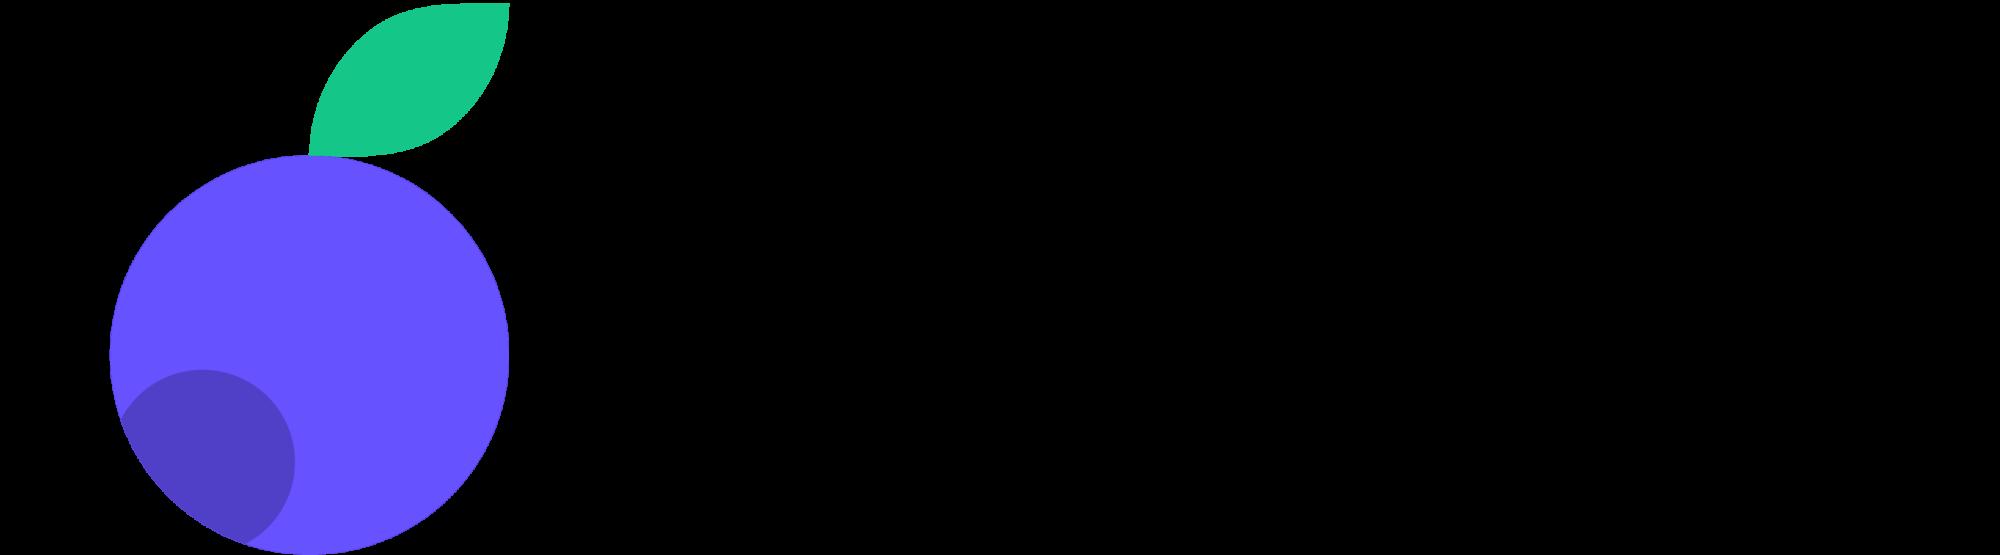 Bilberrry logo